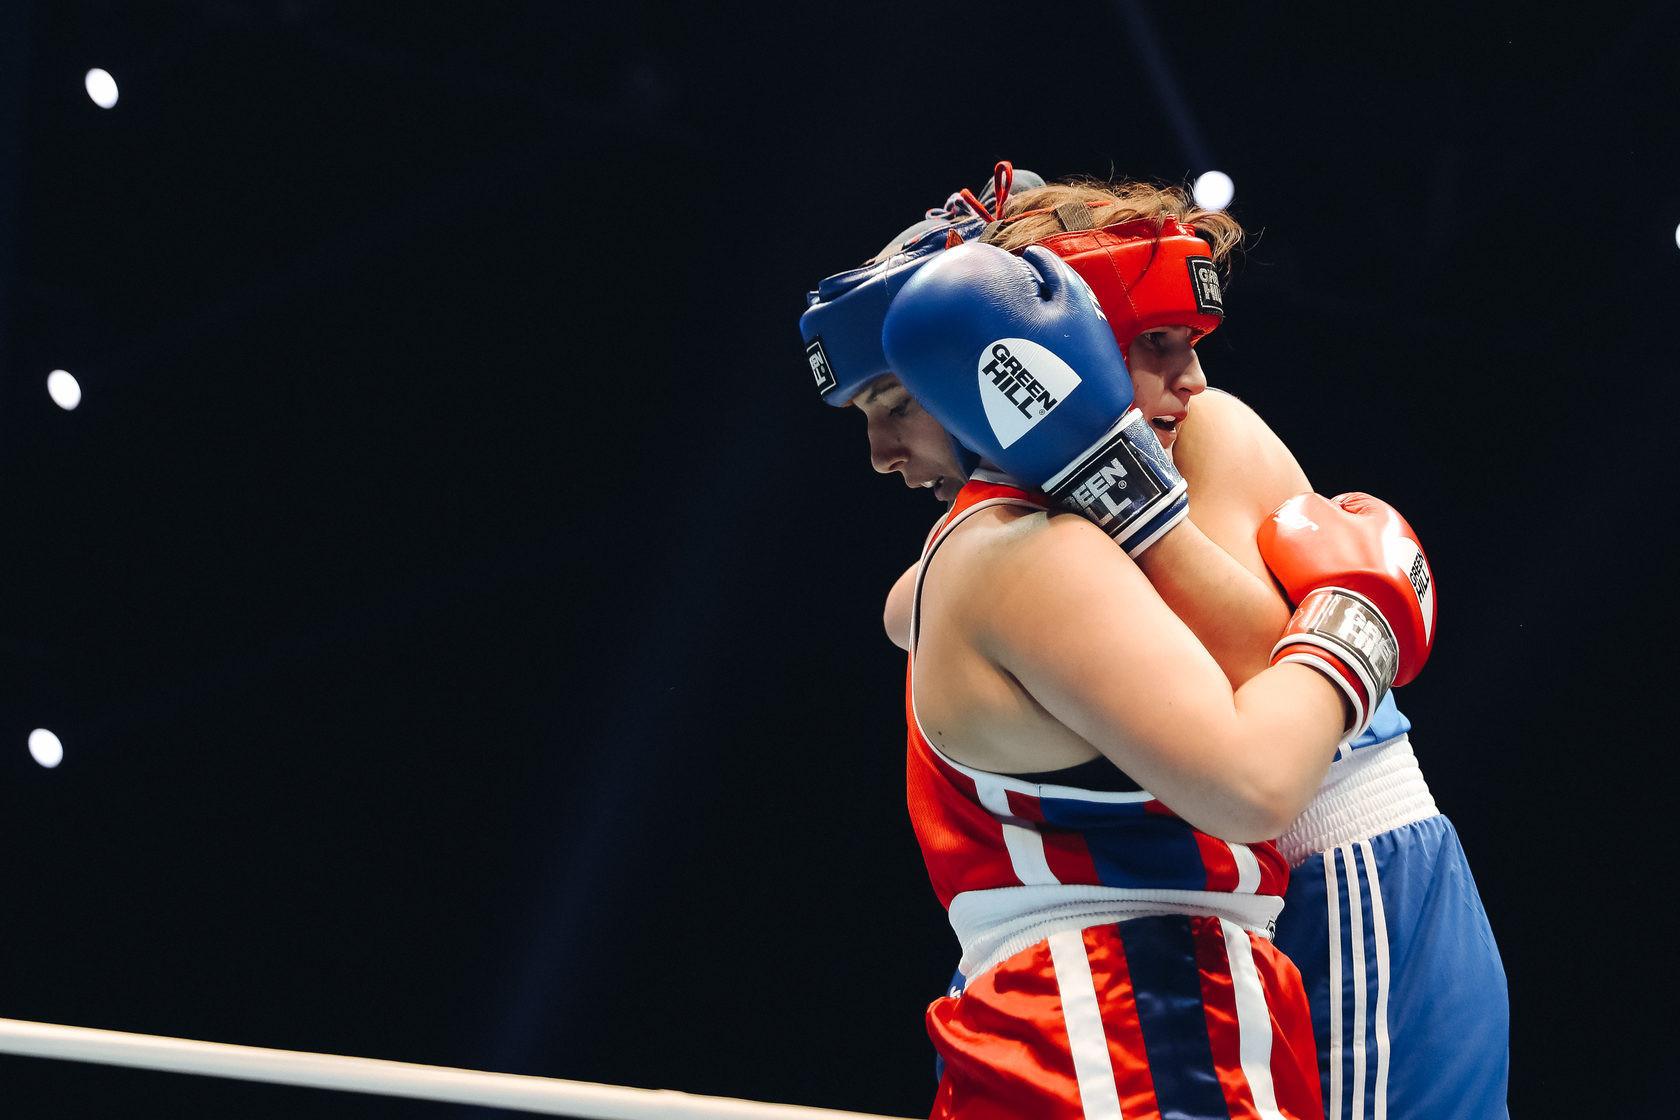 Poland's Aneta Rygielska came up against Ala Yarshevich of Belarus ©AIBA